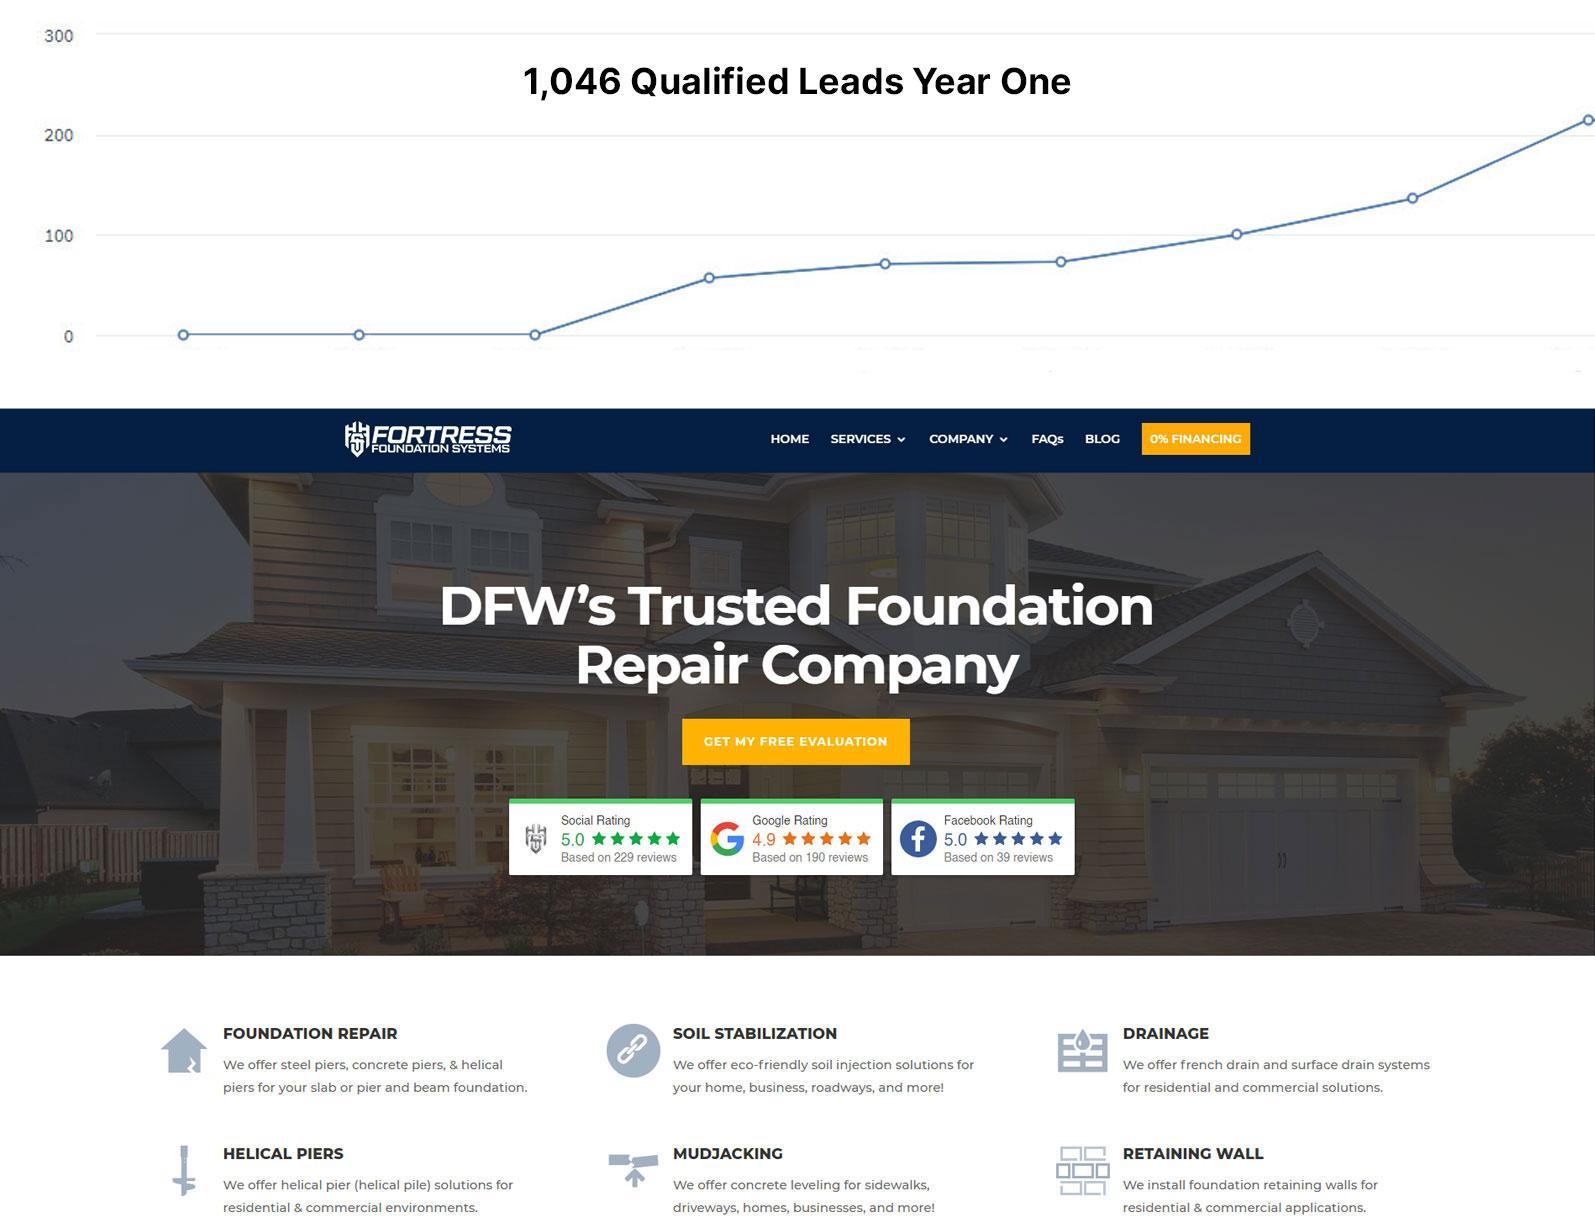 digital marketing agency dallas tx dfw contractors construction home services best companies near me texas digital marketing companies 4